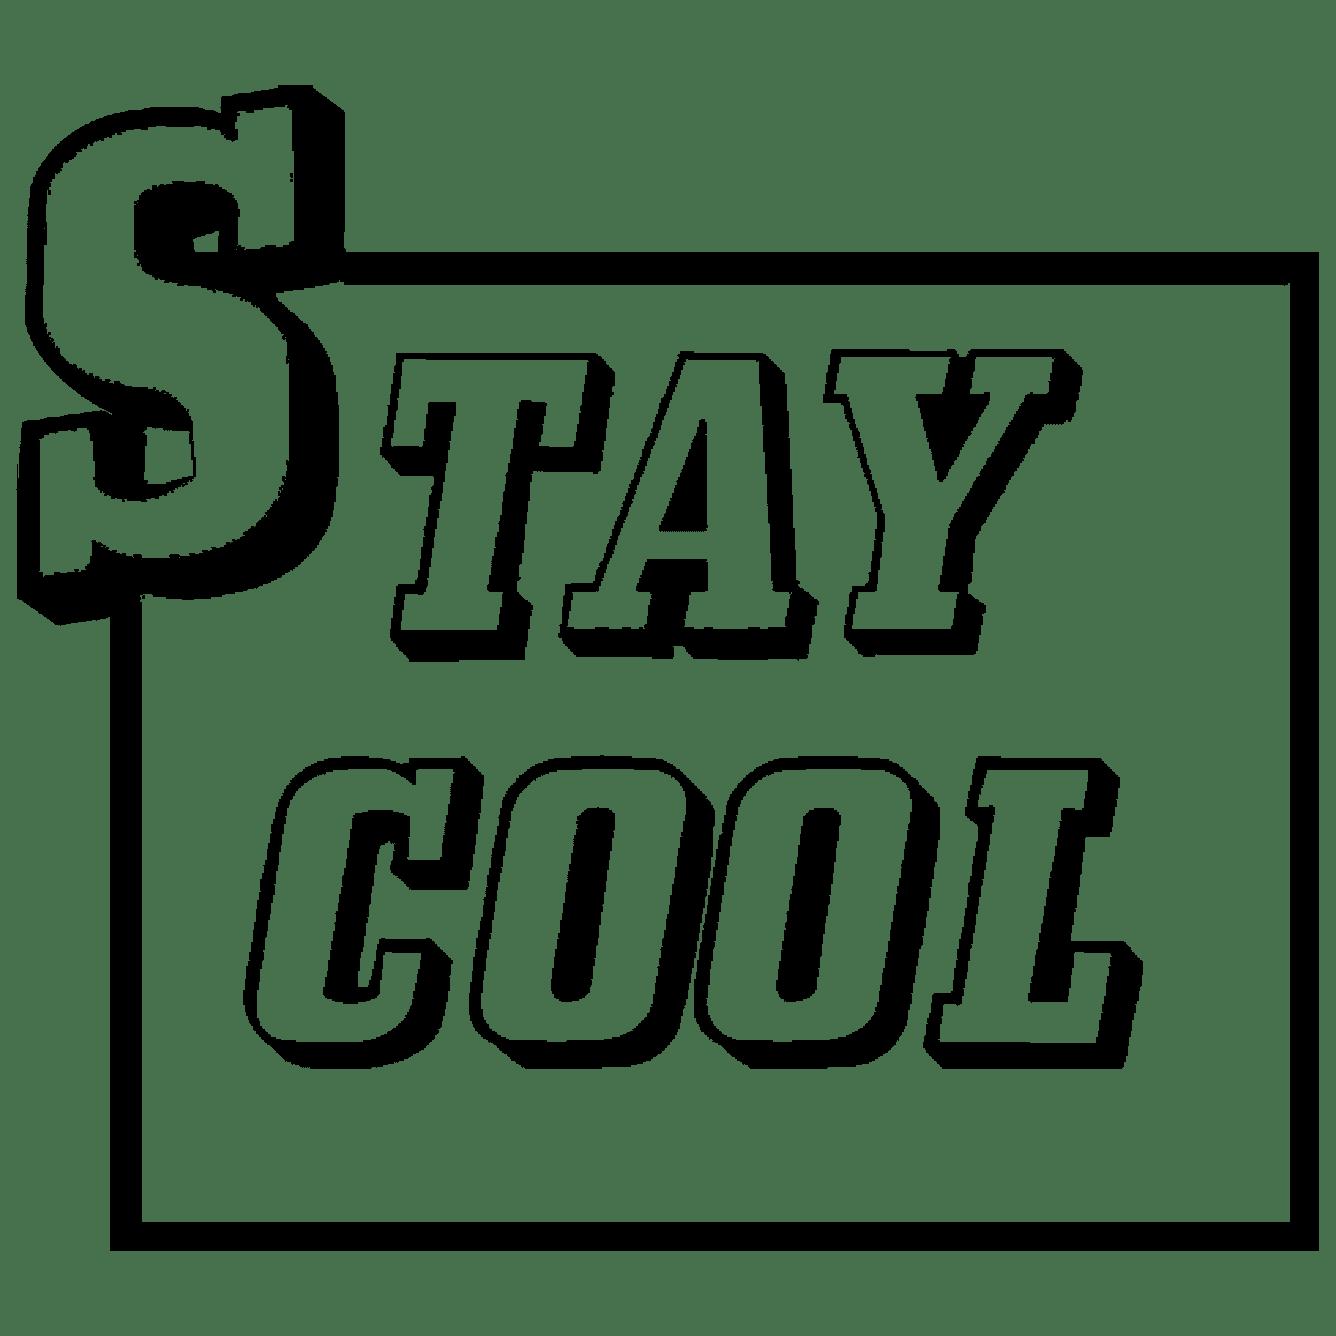 STAYCOOLNYC